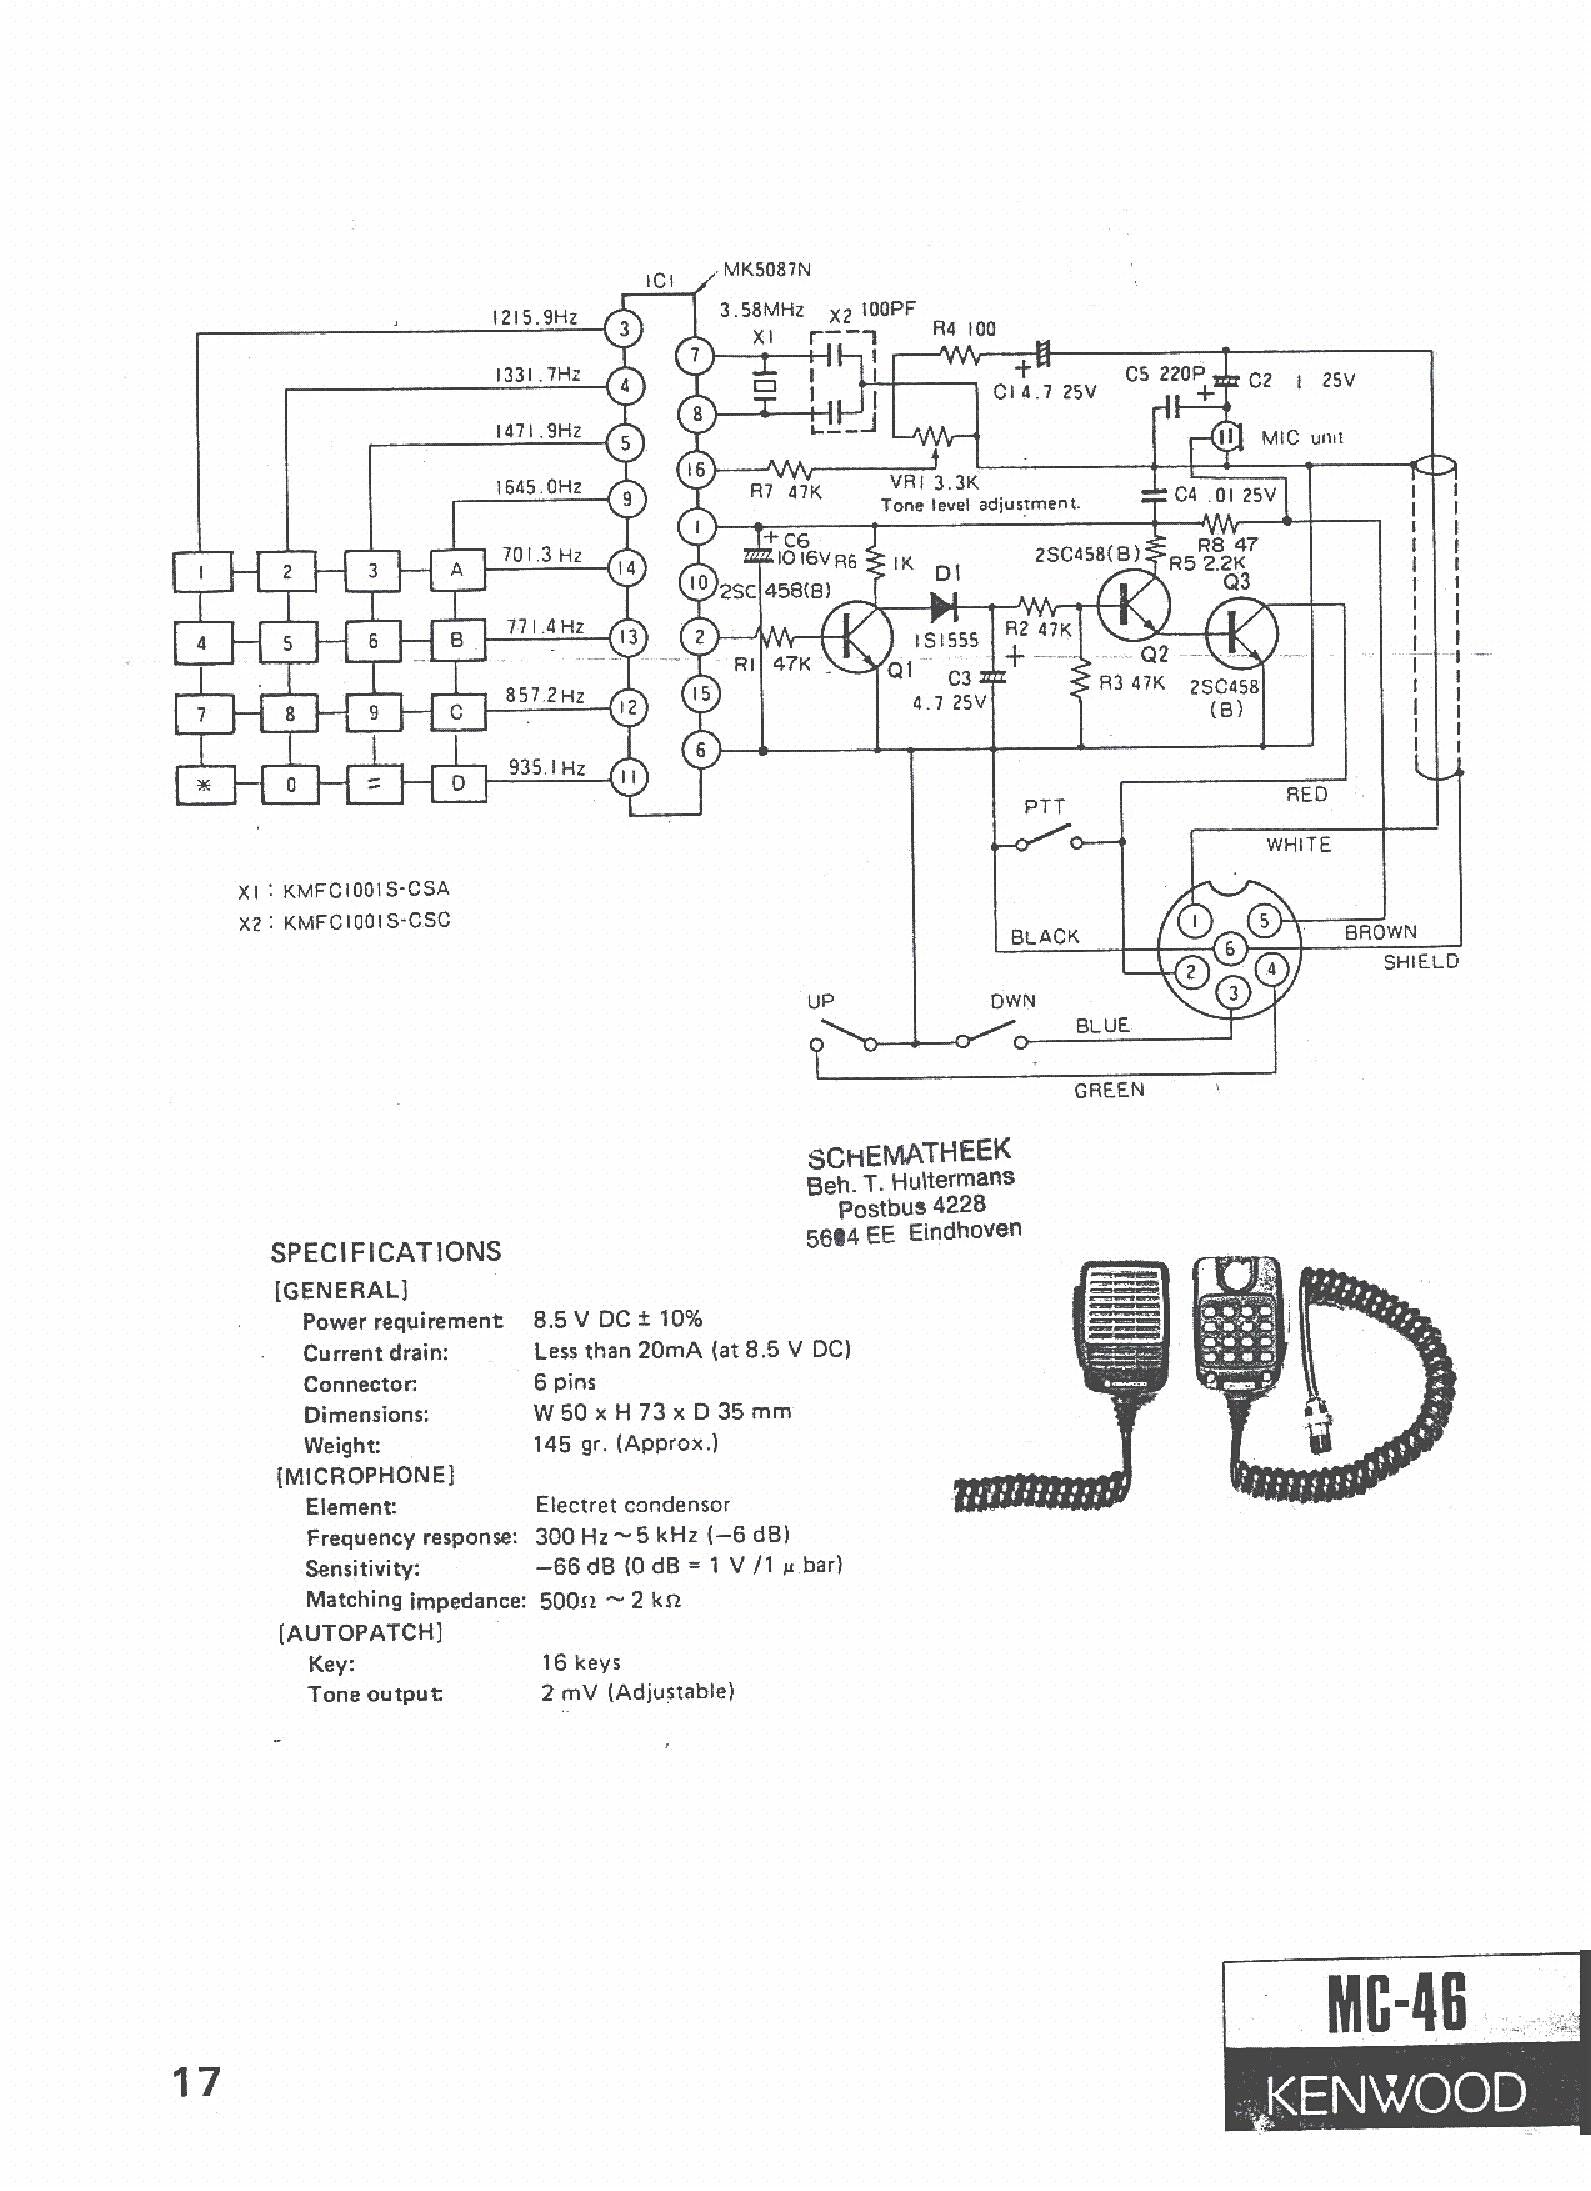 hight resolution of wilkinson pickup wiring diagram wiring library rh 69 kandelhof restaurant de wilkinson single coil pickup wiring diagram wilkinson single coil pickup wiring